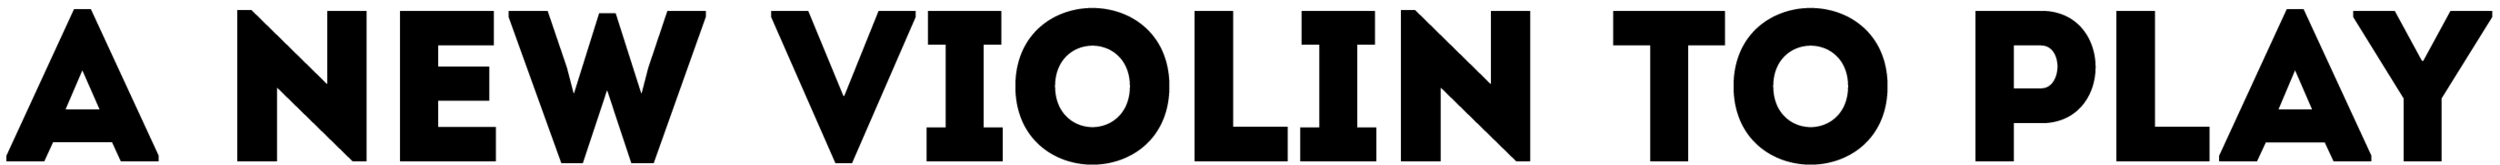 burk-uzzle-subs-2.png